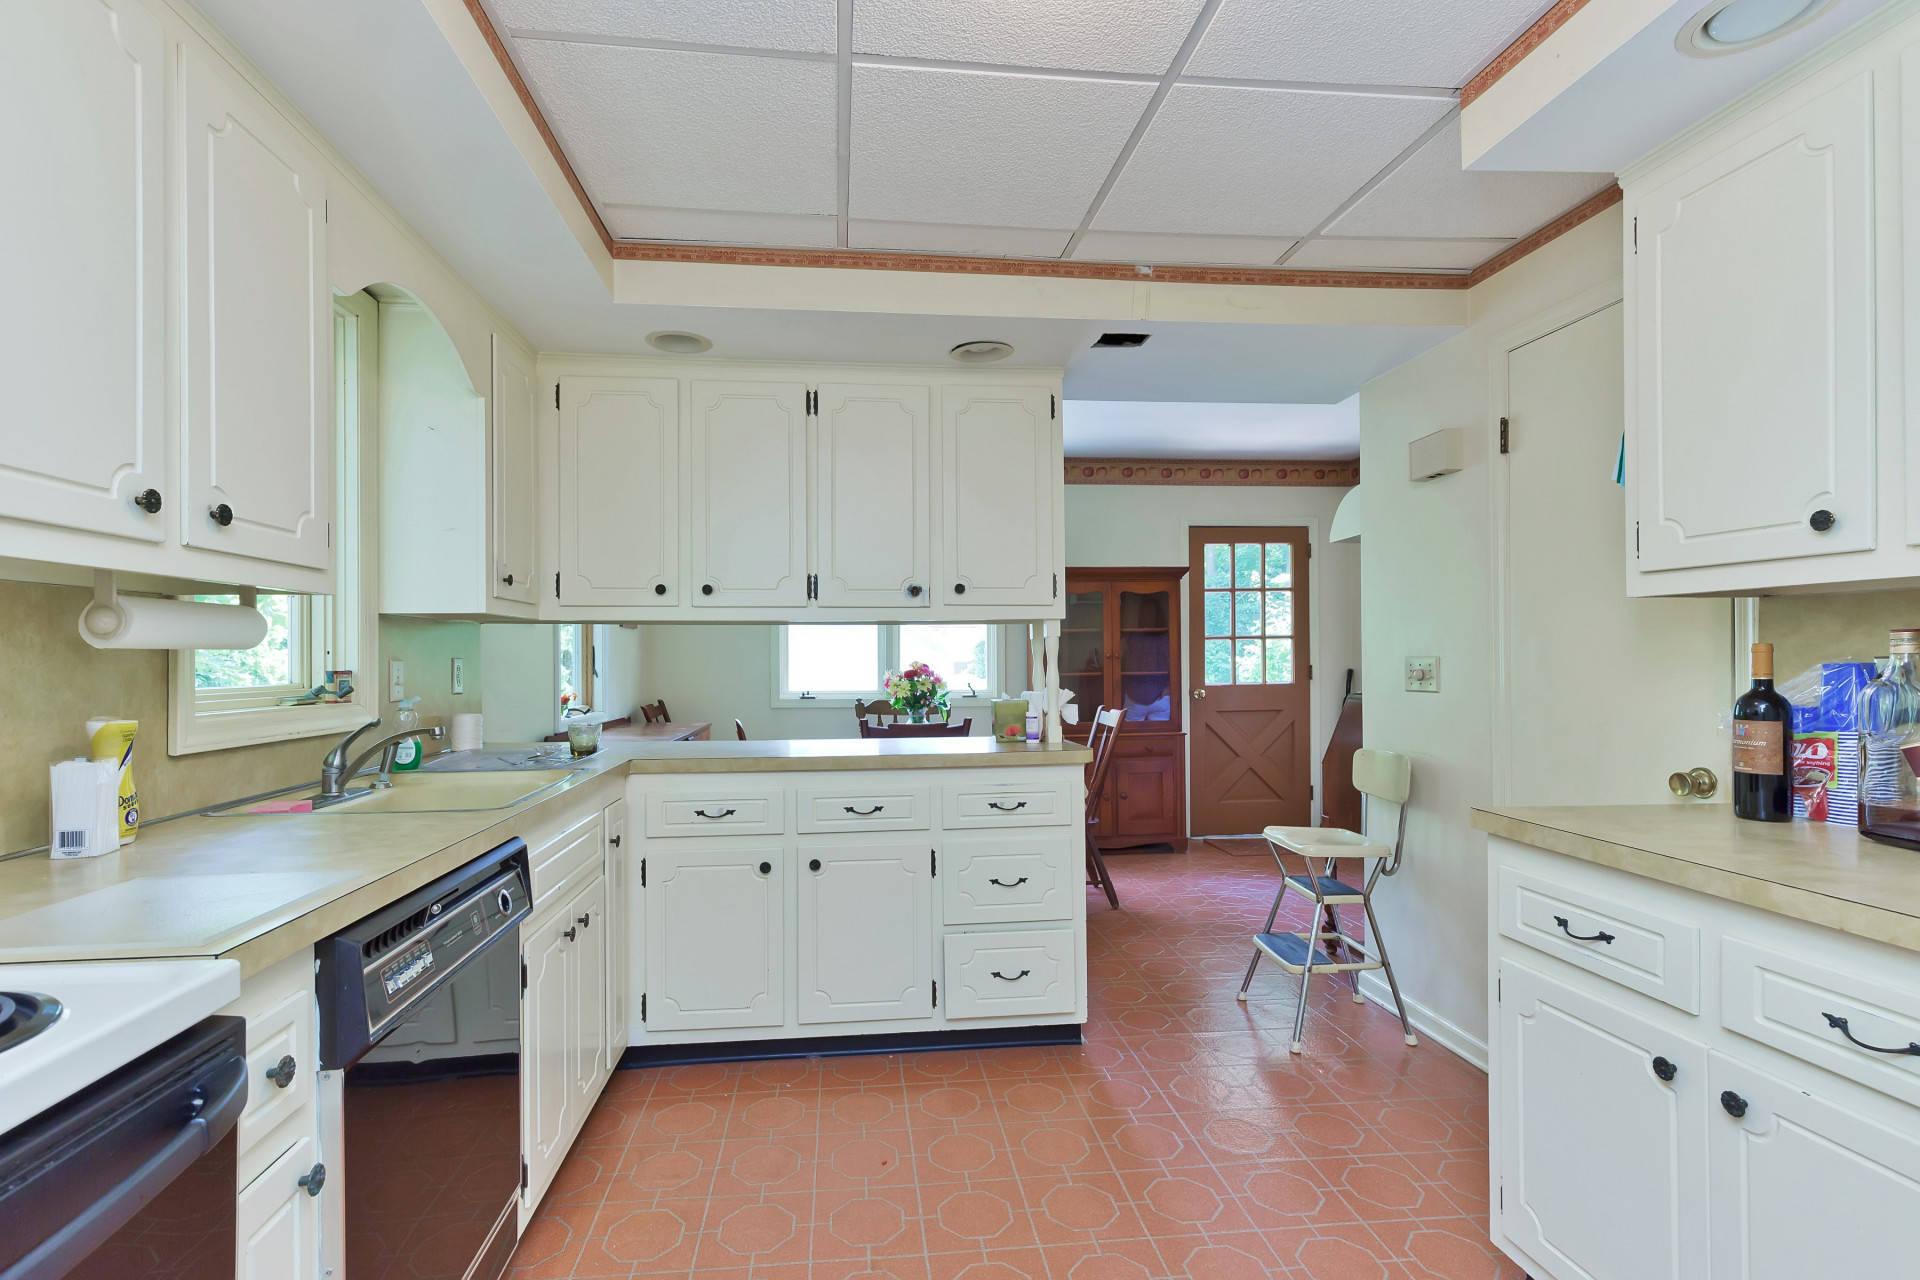 Kitchen cabinets summit nj - 012 240608 Img_8373_5337798 Jpg